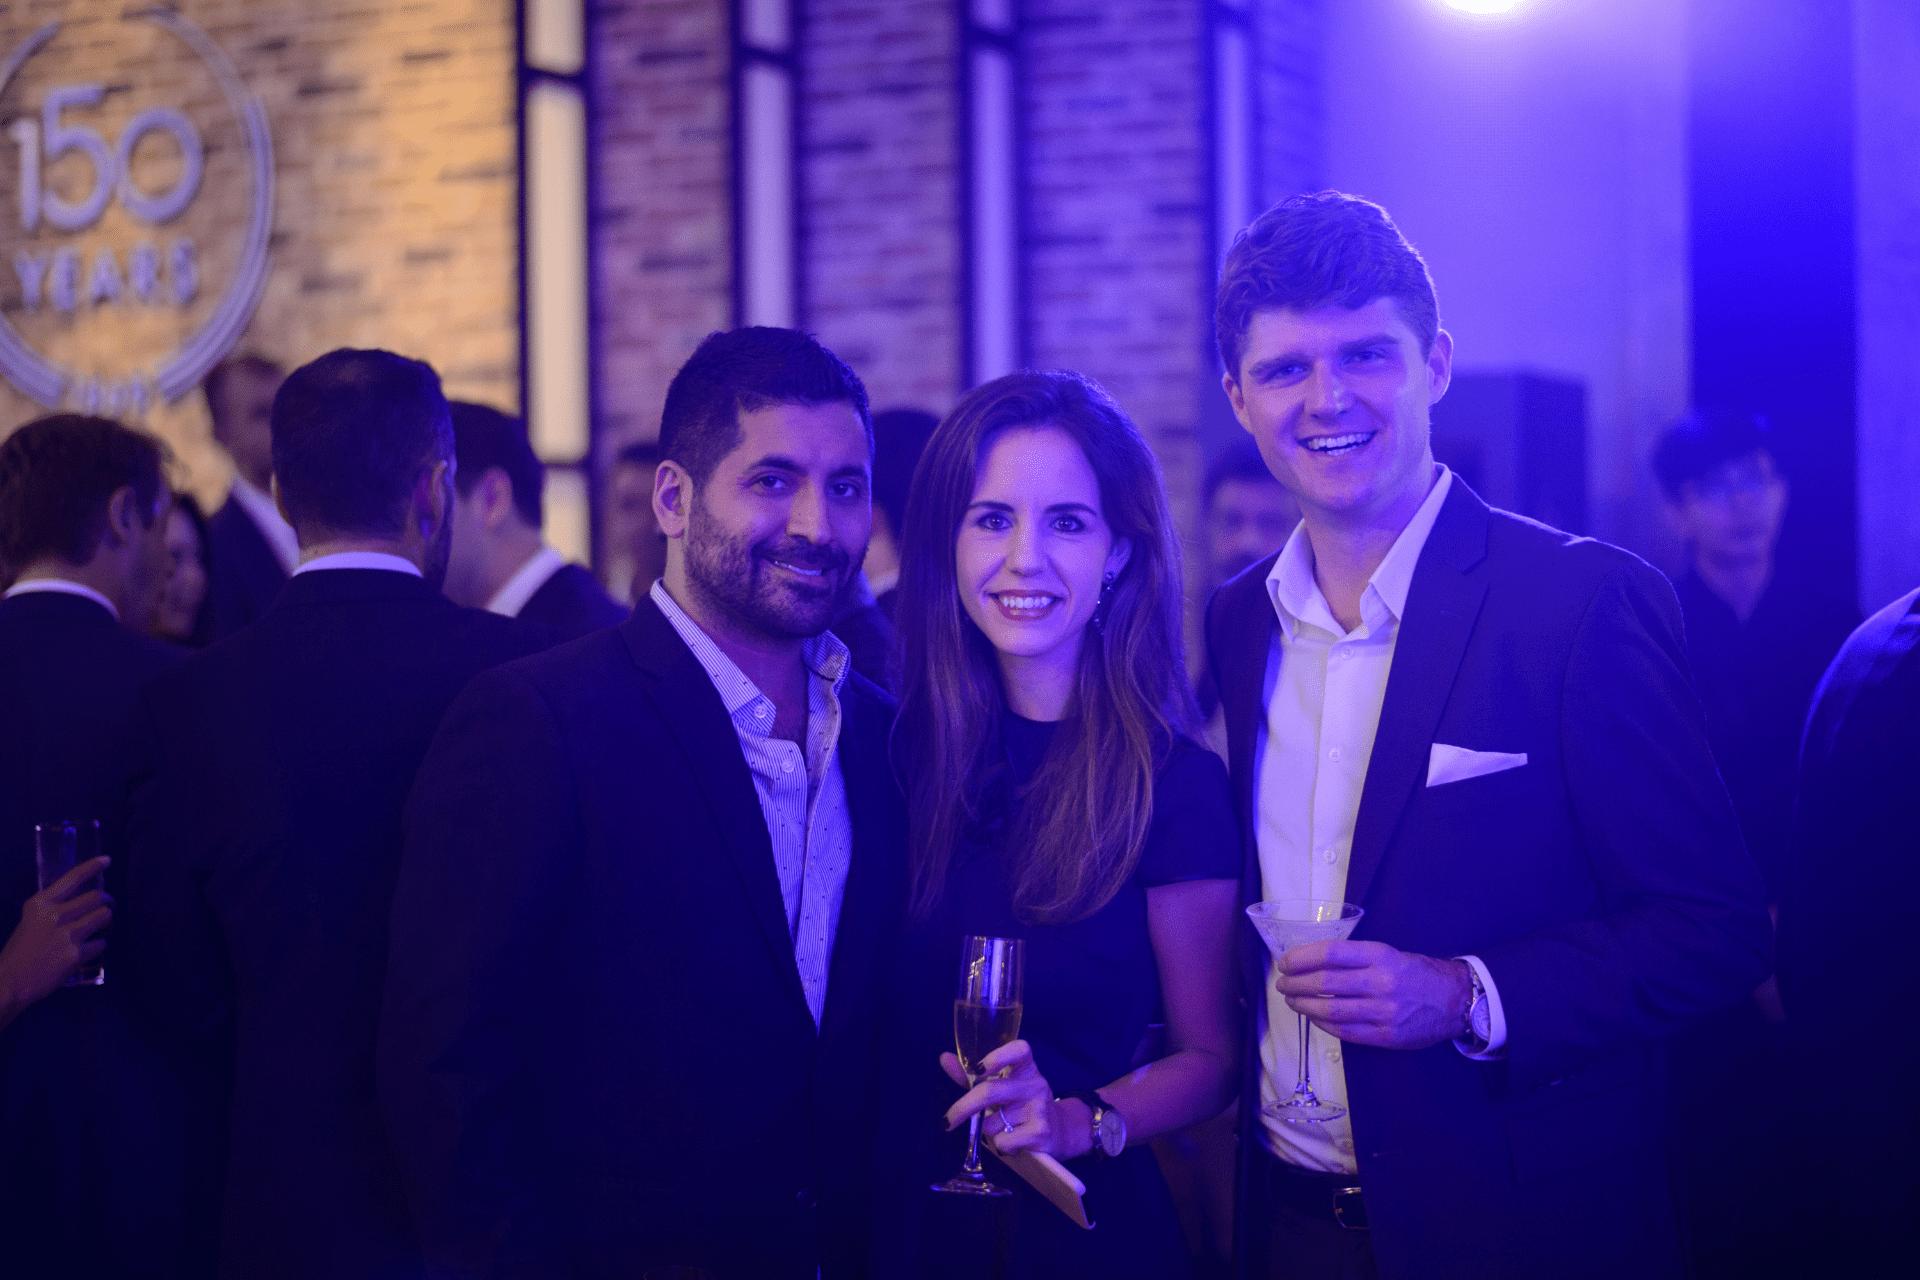 Raj Datwani, Sophie Guanter and Thomas Kempf